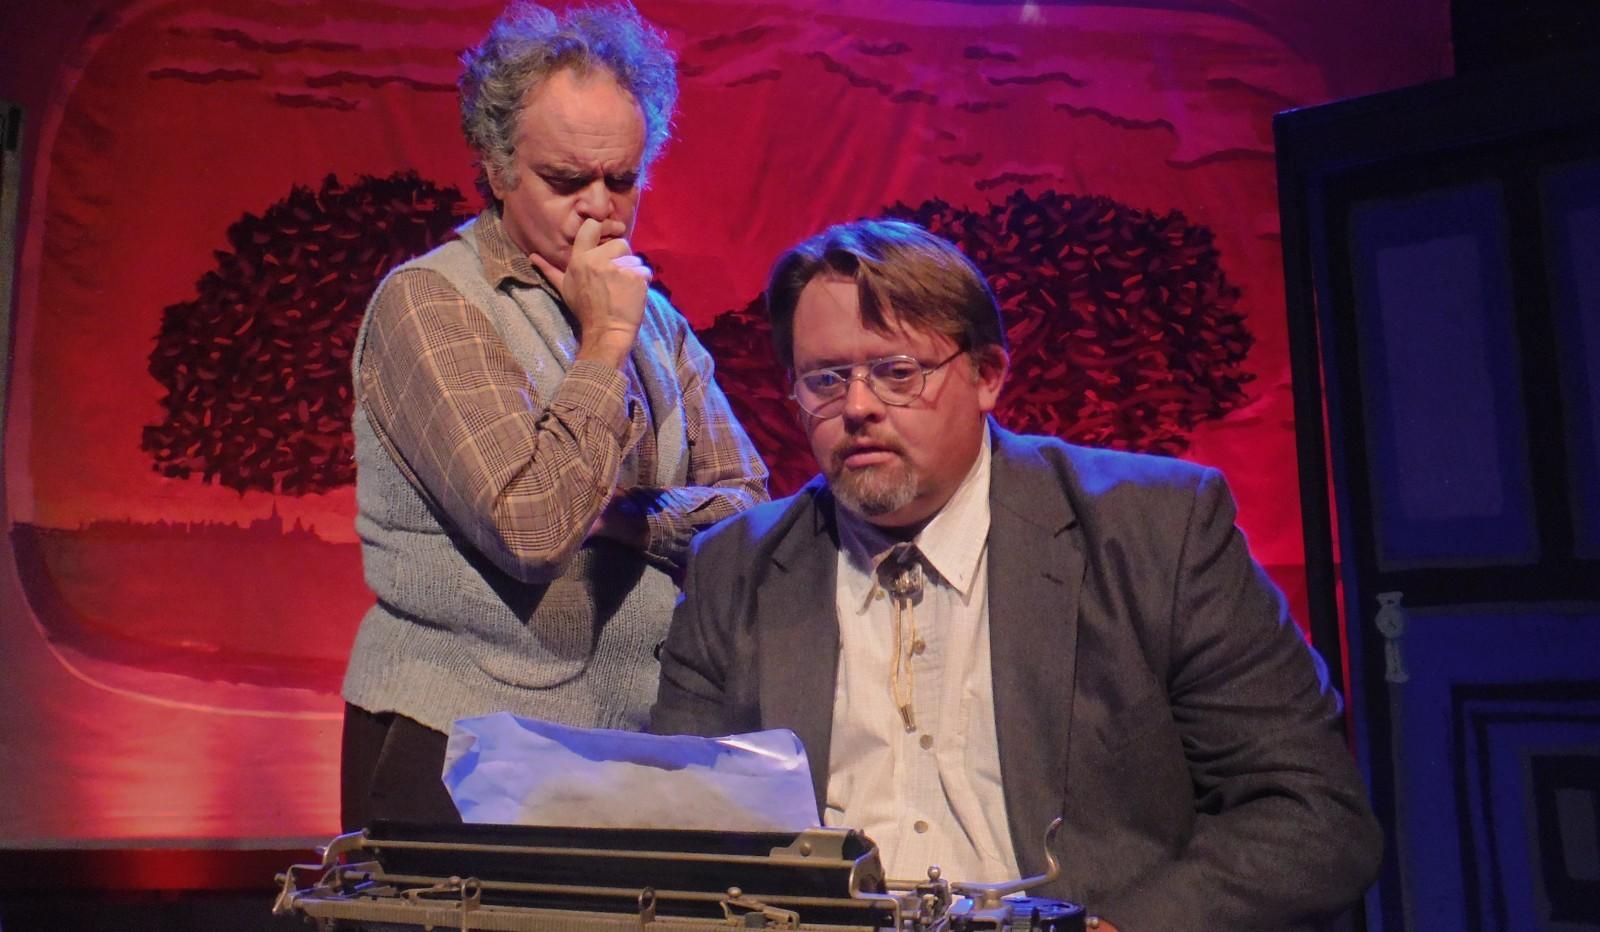 Tim Joyce and John Kennedy star in Subversive Theatre's season-opening production of 'Slaughterhouse Five.'